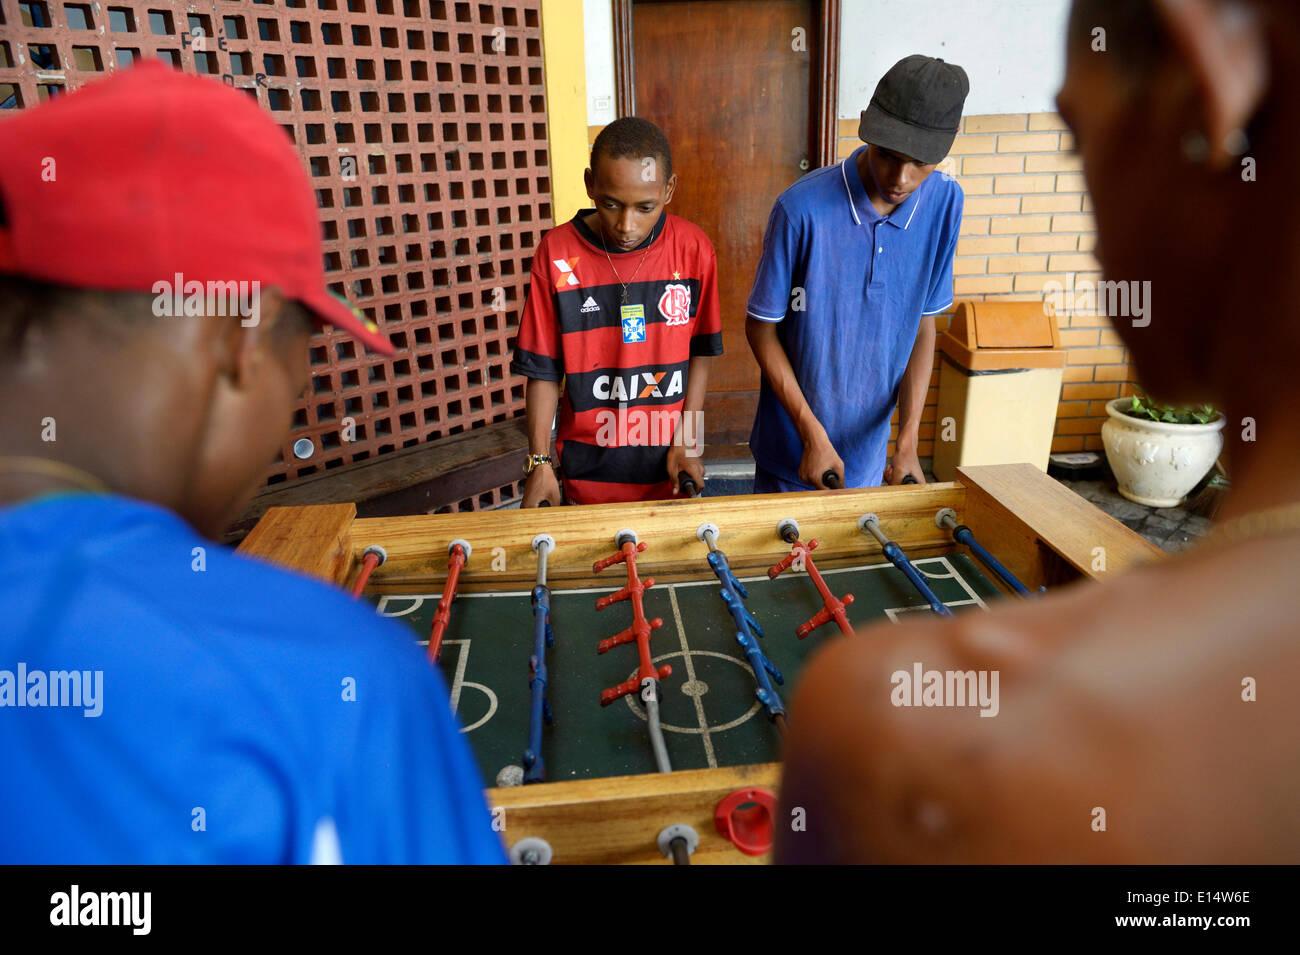 Boys playing table football, Sao Martinho social project for street children, Lapa district, Rio de Janeiro - Stock Image